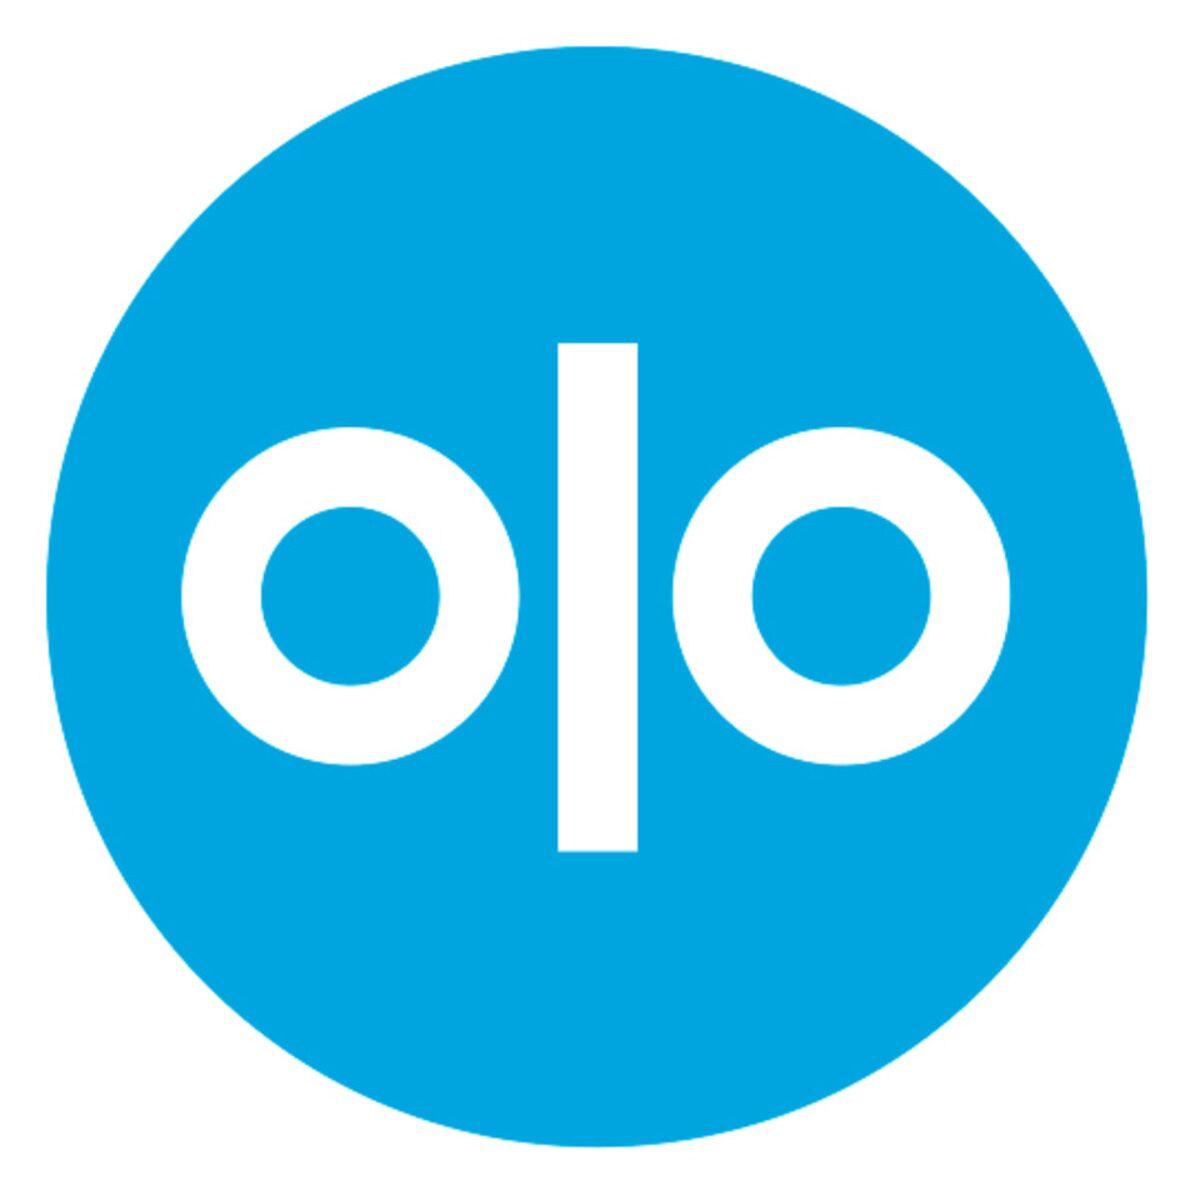 IPO Olo Inc.: аналитика, обзор и финансовые показатели компании